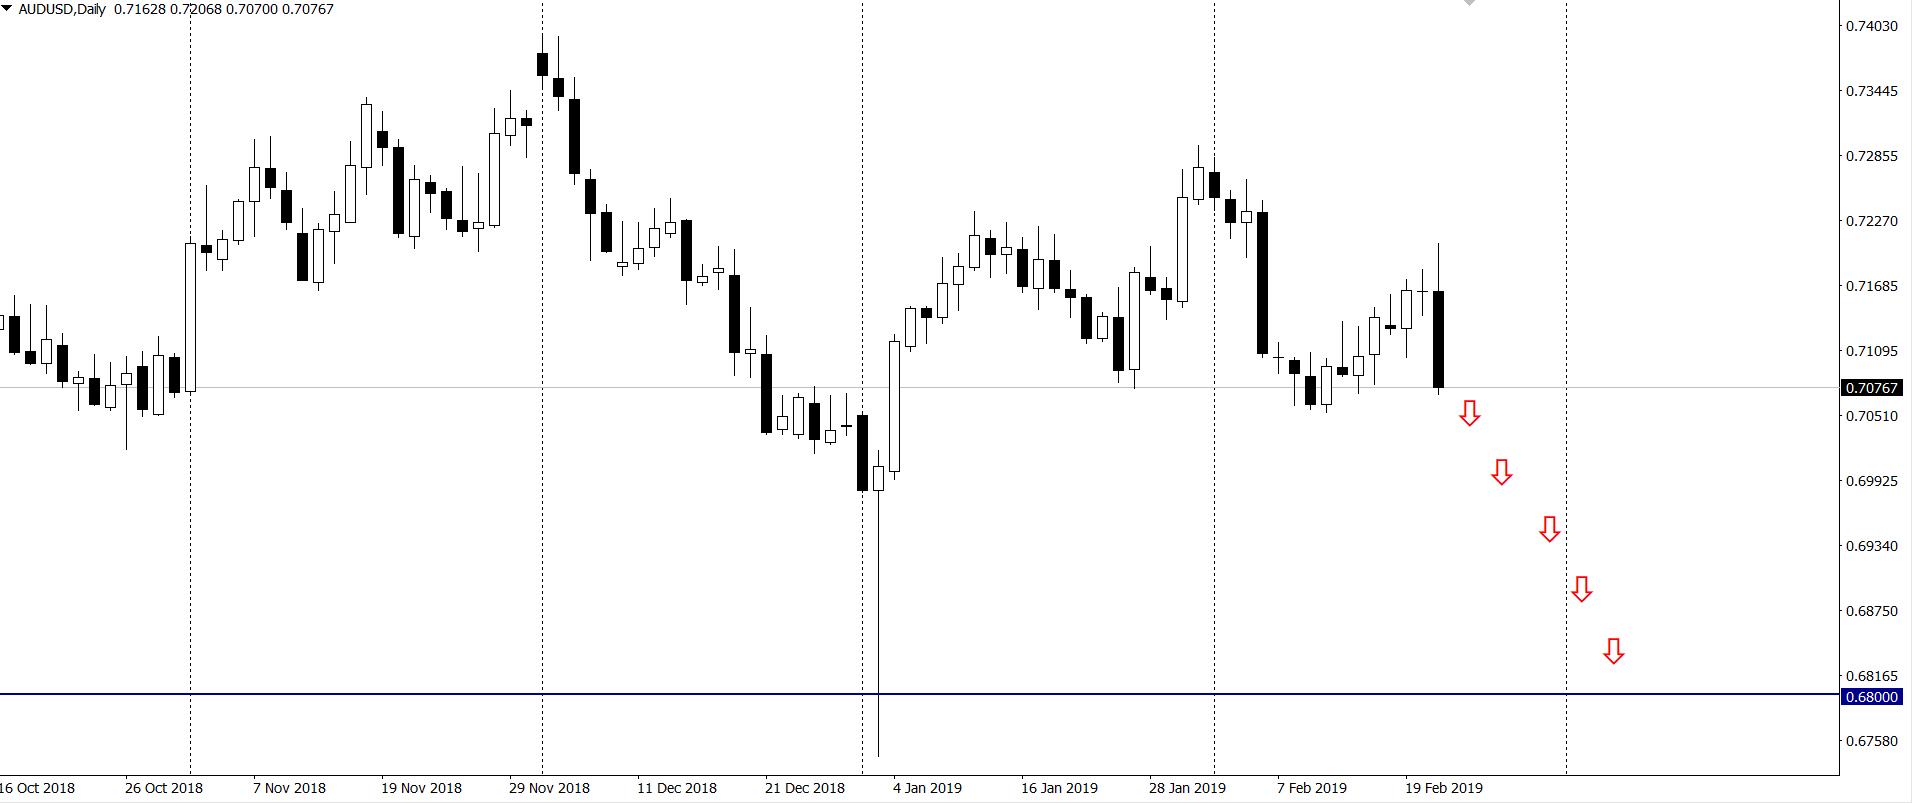 RBA obetnie stopy w sierpniu i listopadzie, a AUD/USD spadnie do 0.68 – prognoza Westpac i Rabobanku